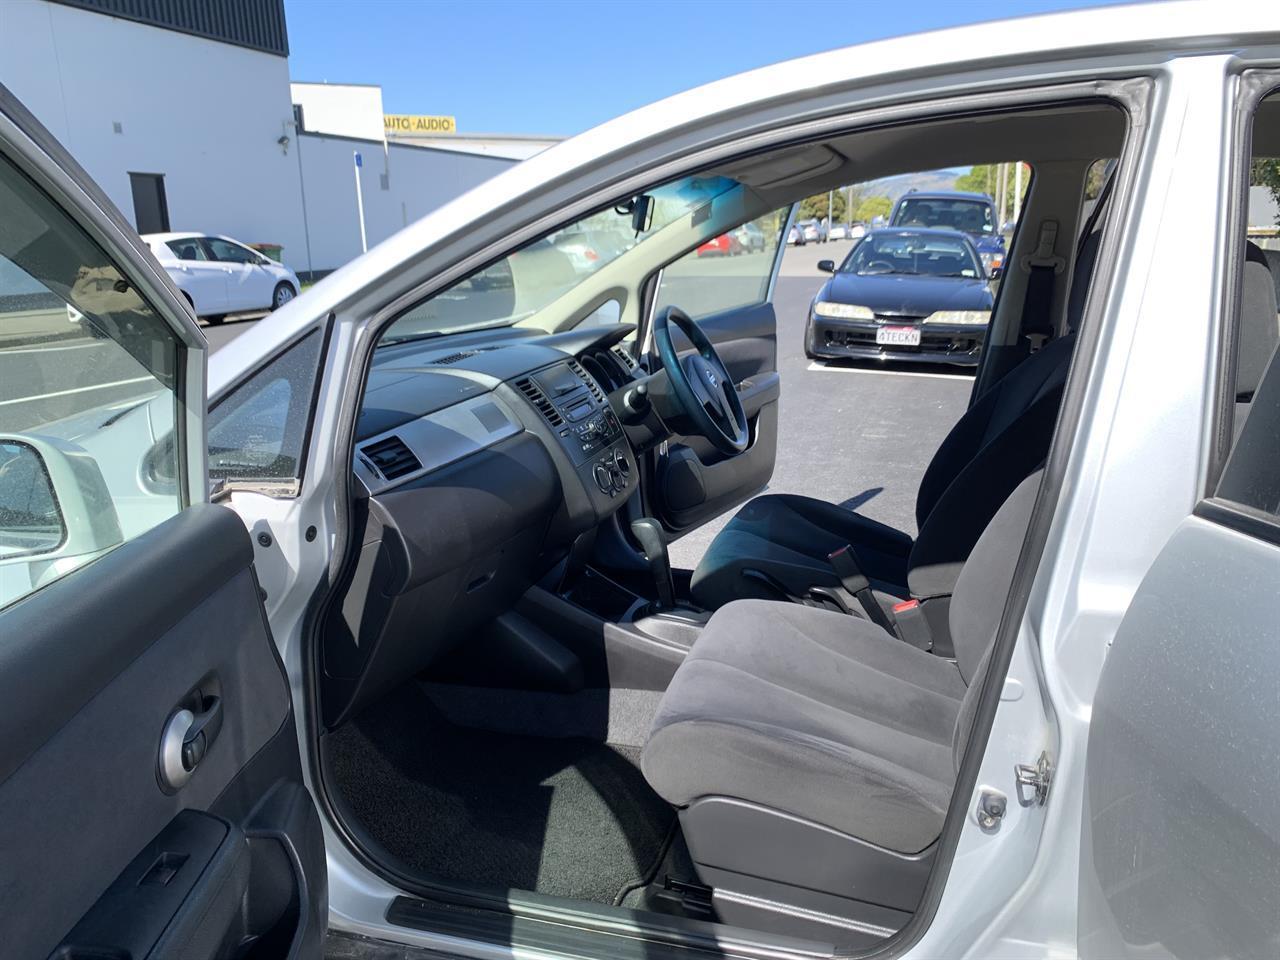 image-10, 2011 Nissan Tiida LATIO SILVER SALOON at Christchurch